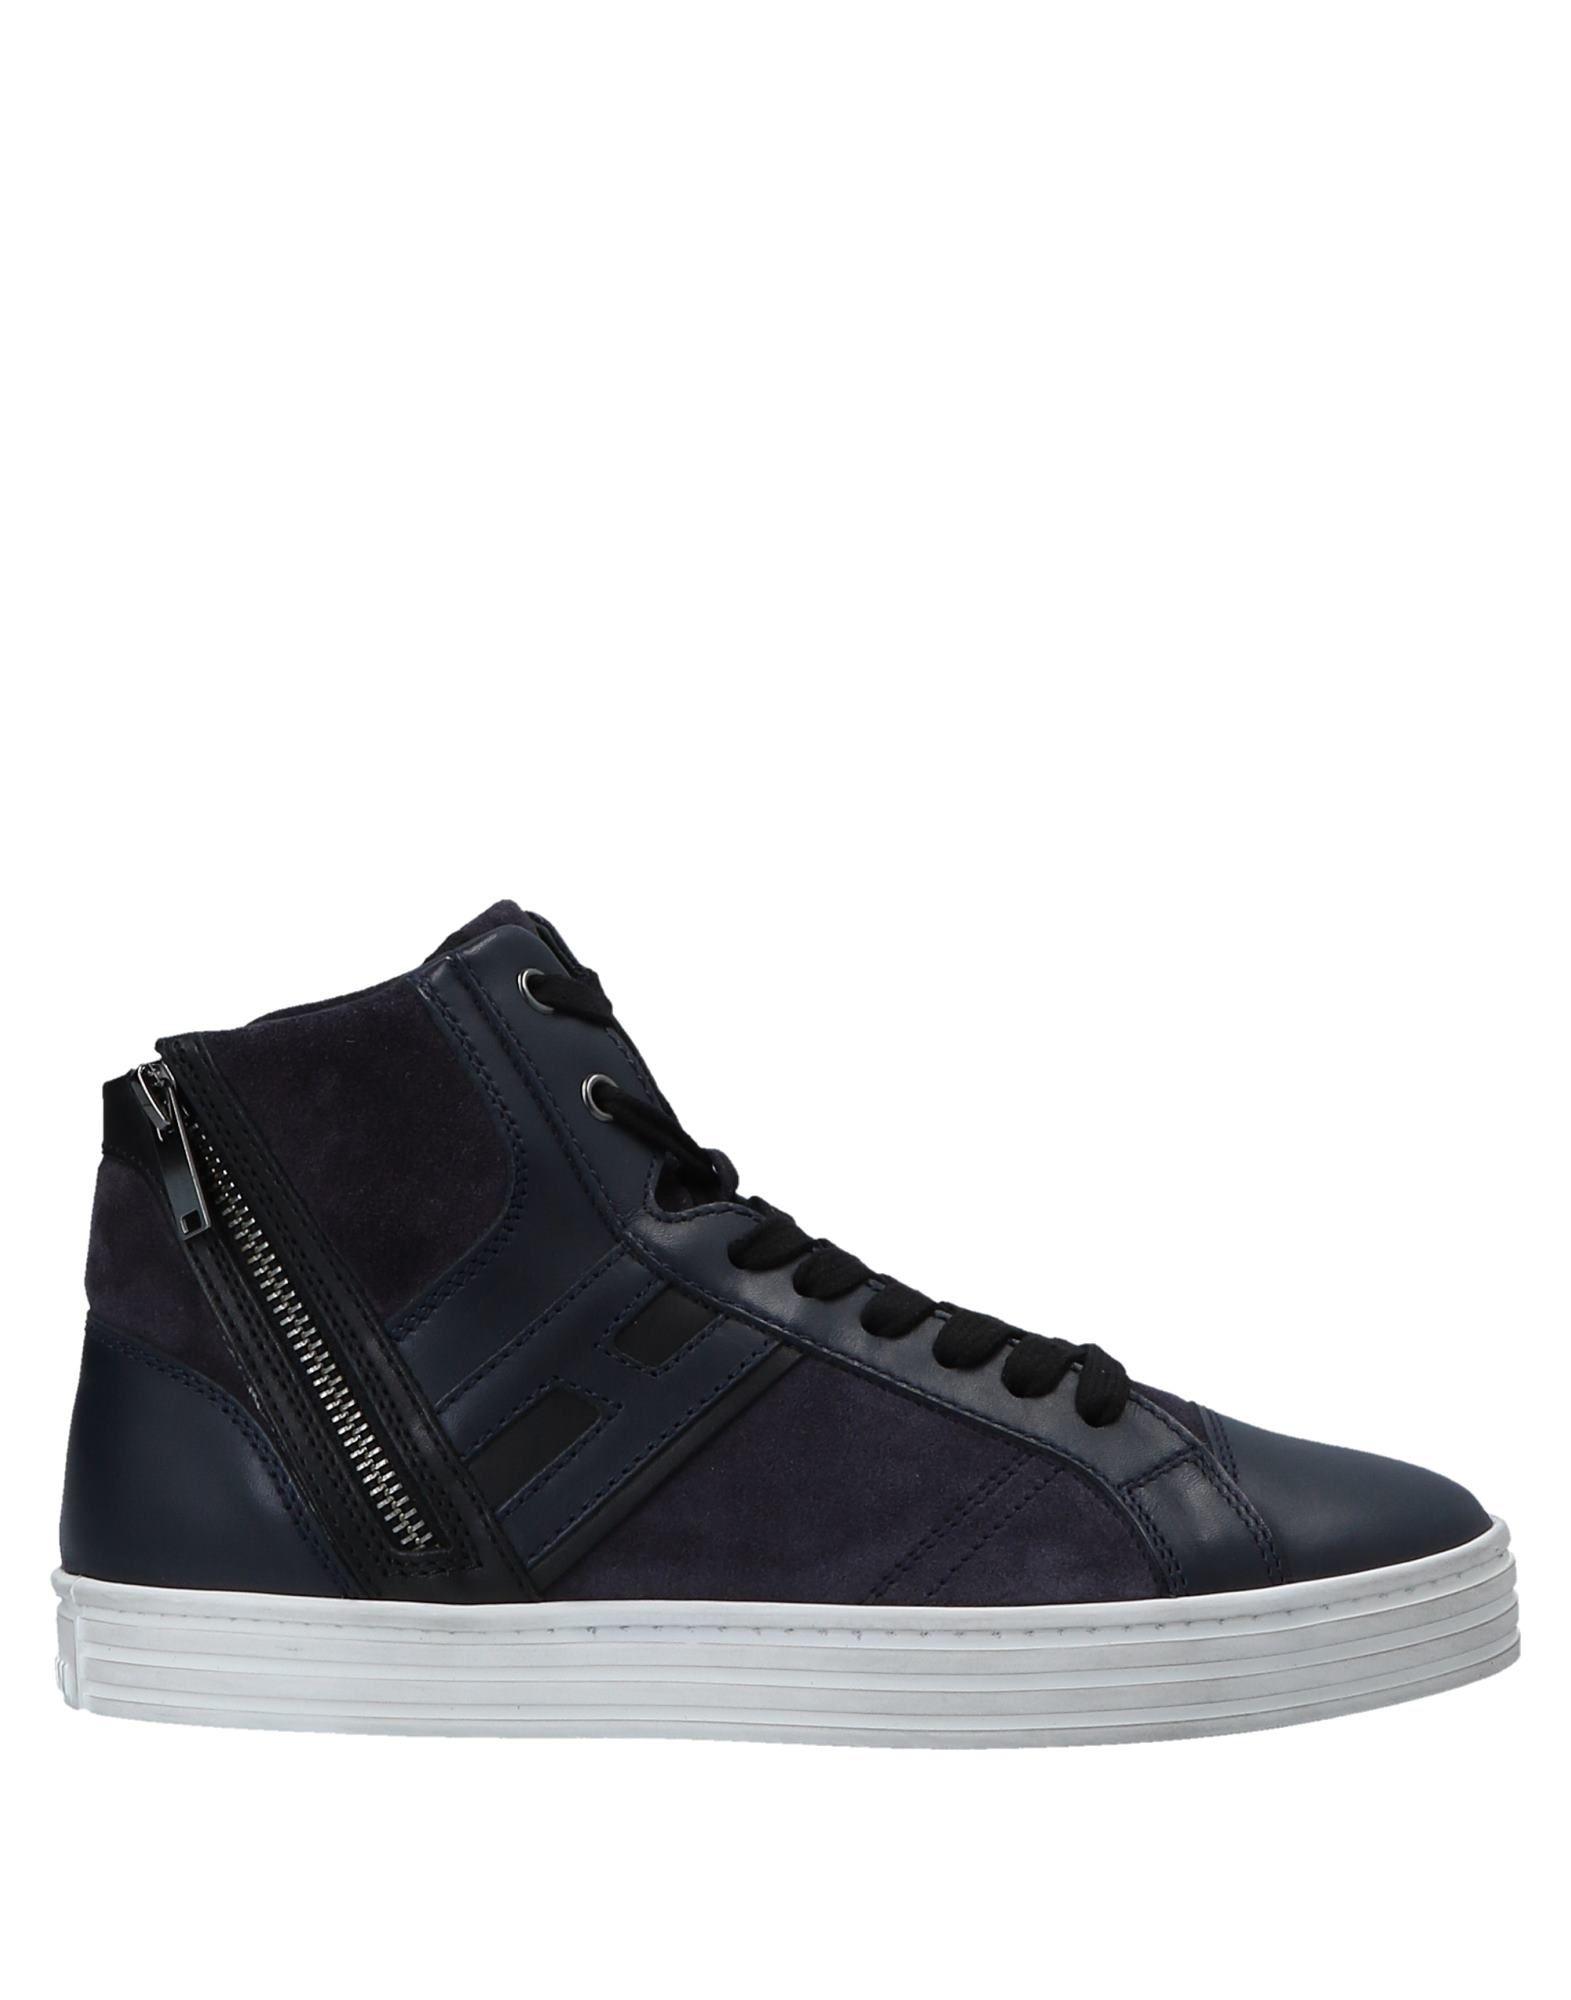 Hogan Sneakers Herren  11559953LI Gute Qualität beliebte Schuhe